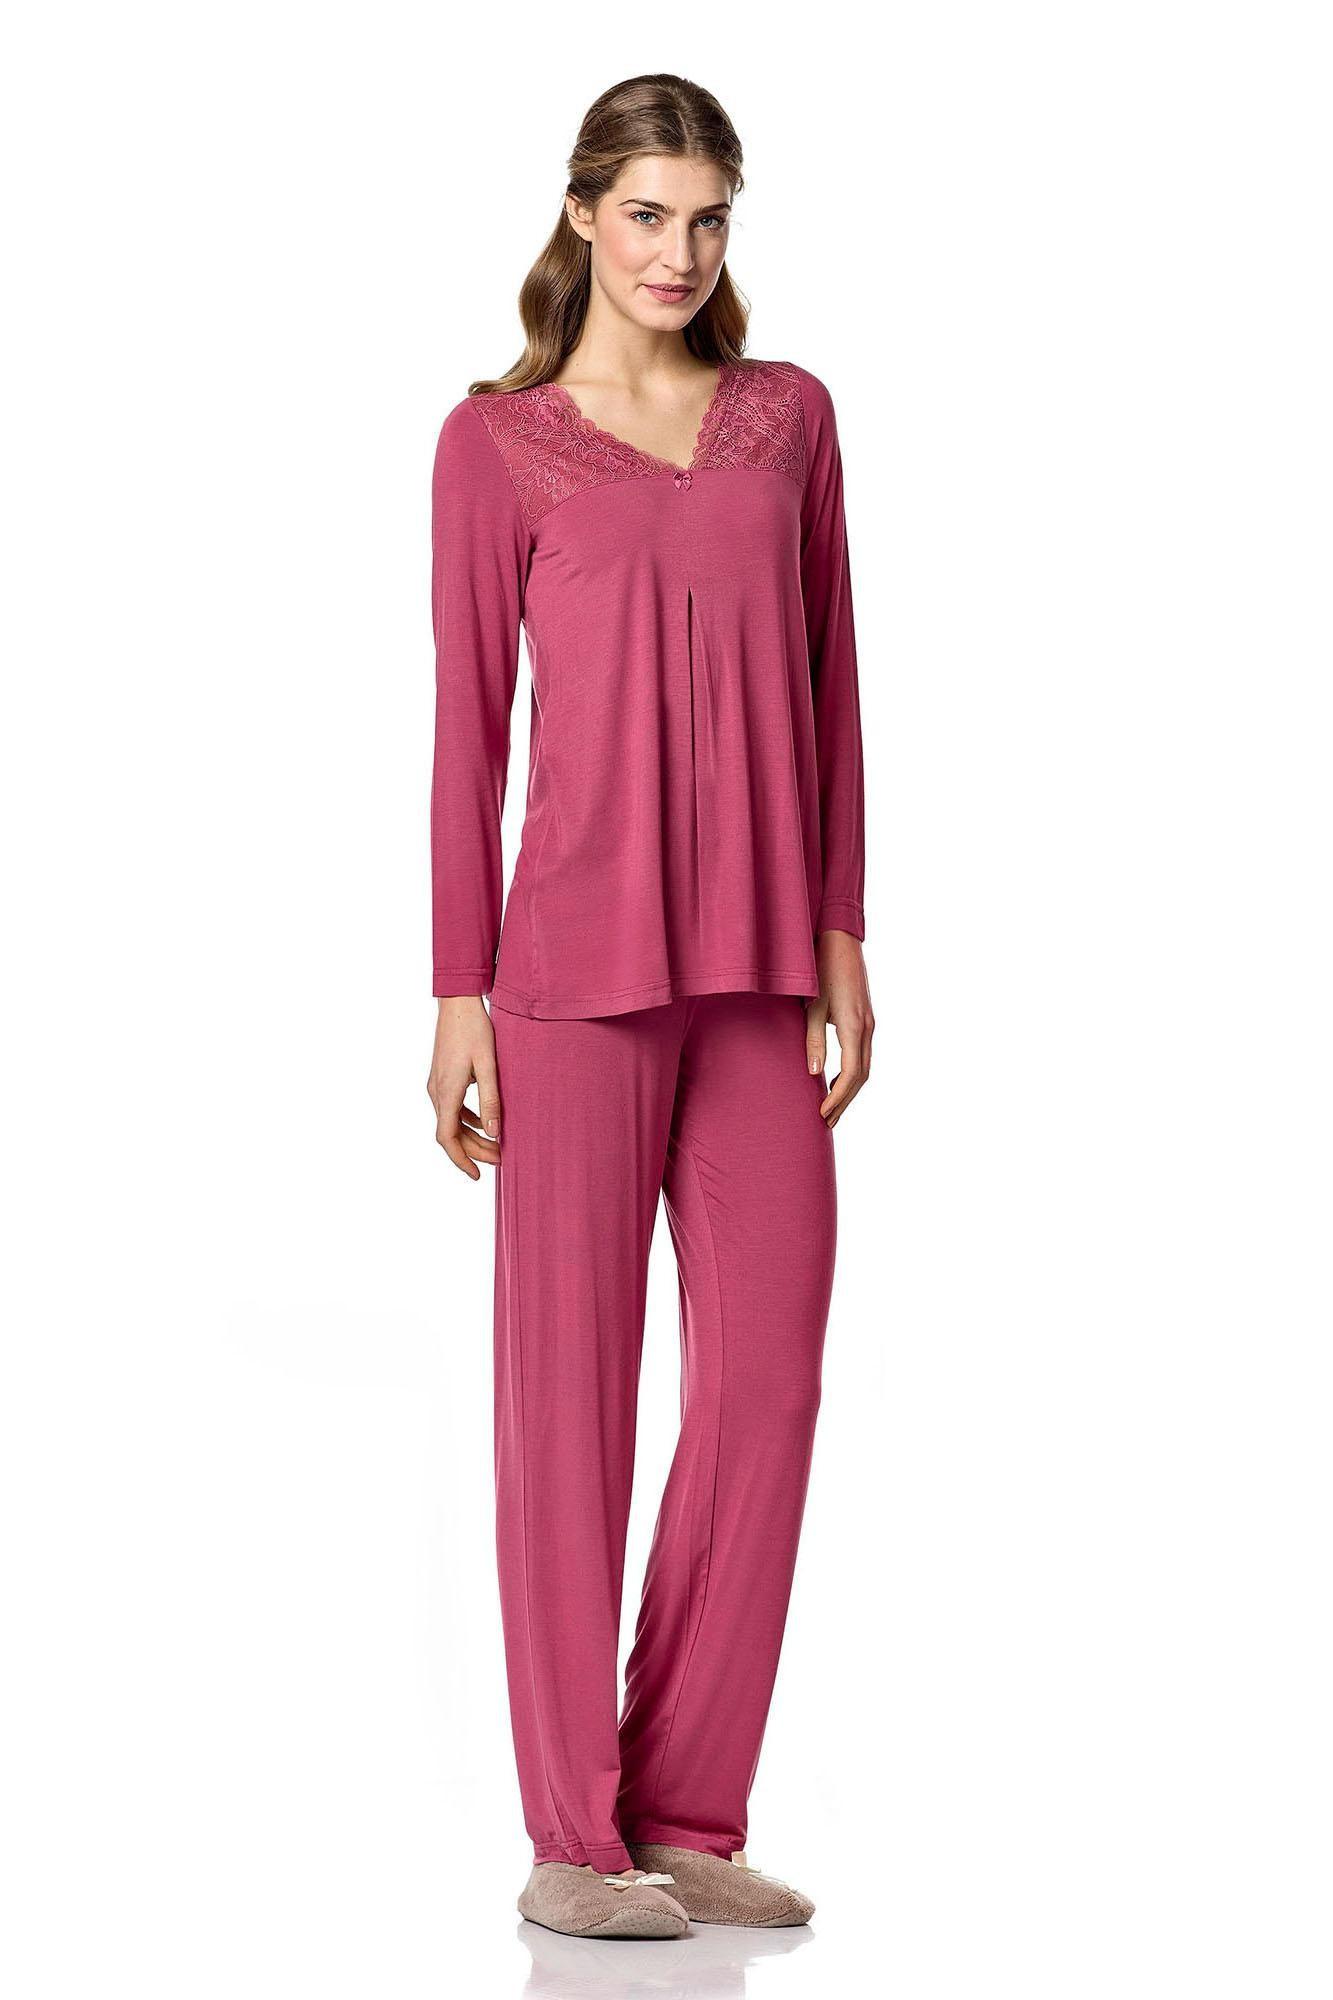 Dámské pyžamo 4786 - Vamp Barva: tm.růžová, Velikost: XL